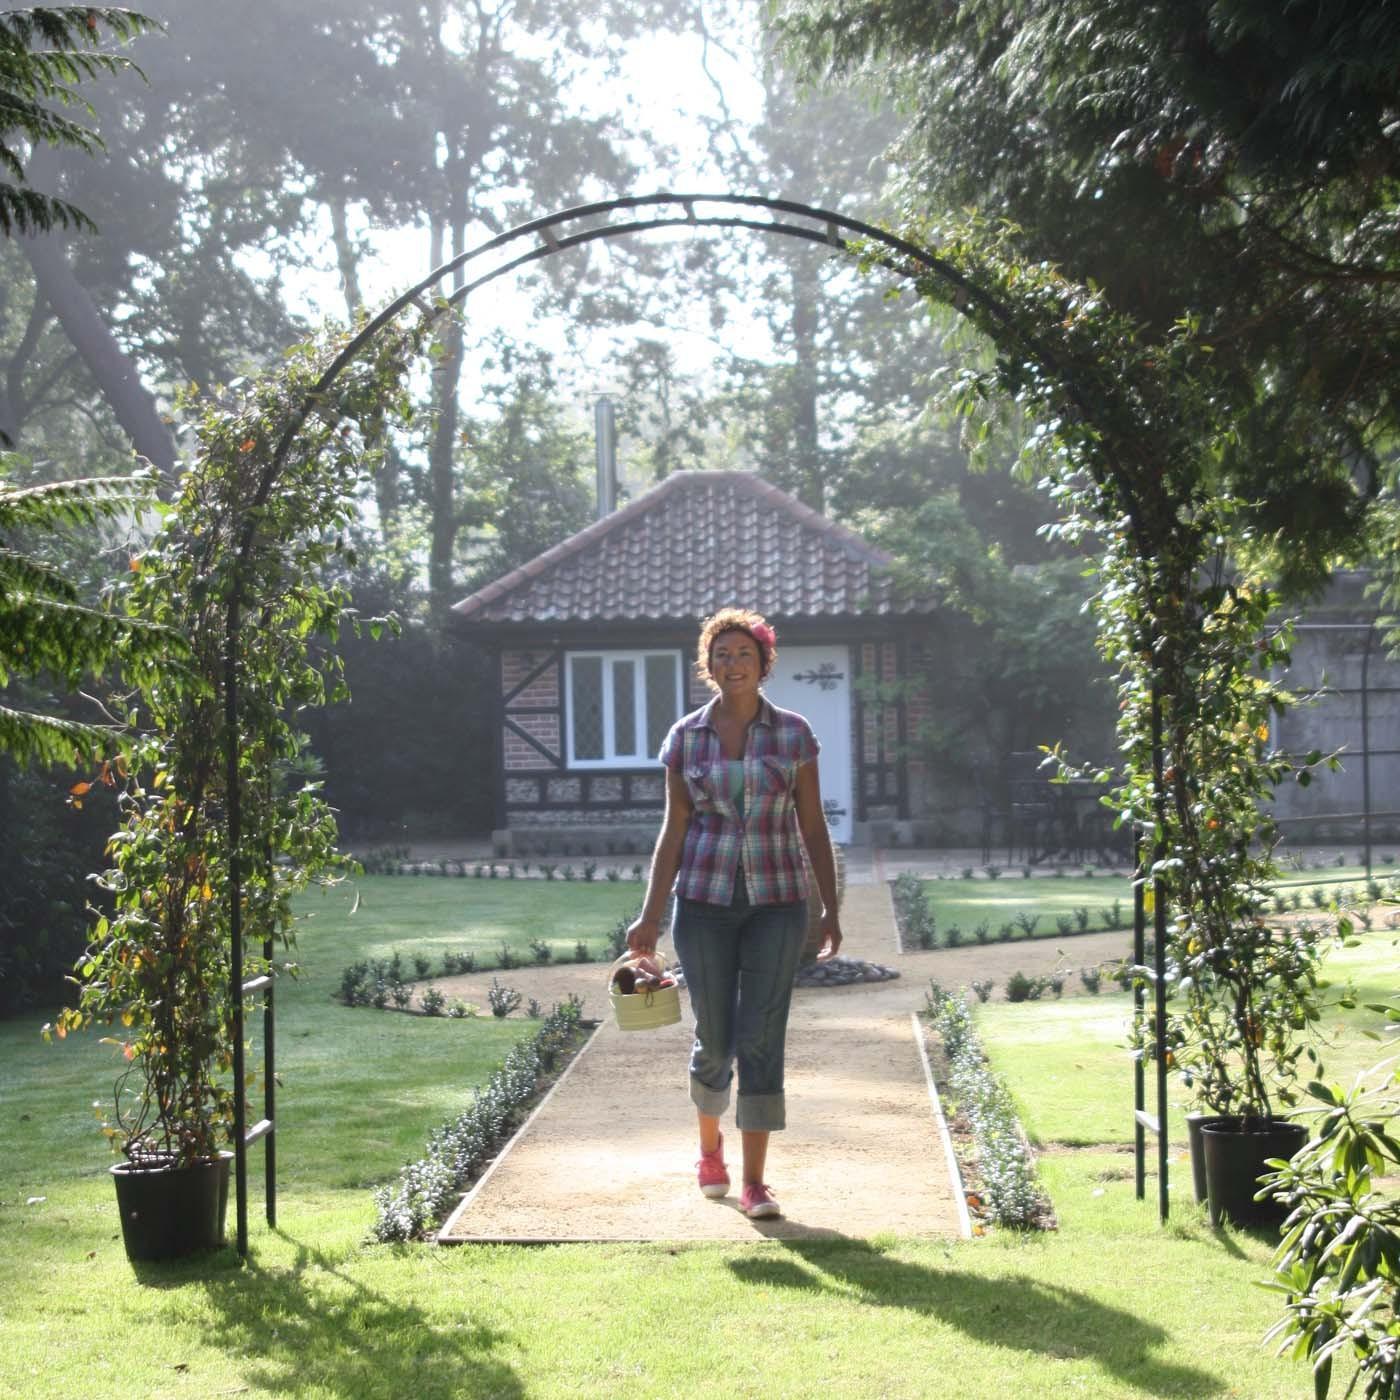 Garden arch designs photograph hover over image to zoom for Roman garden designs